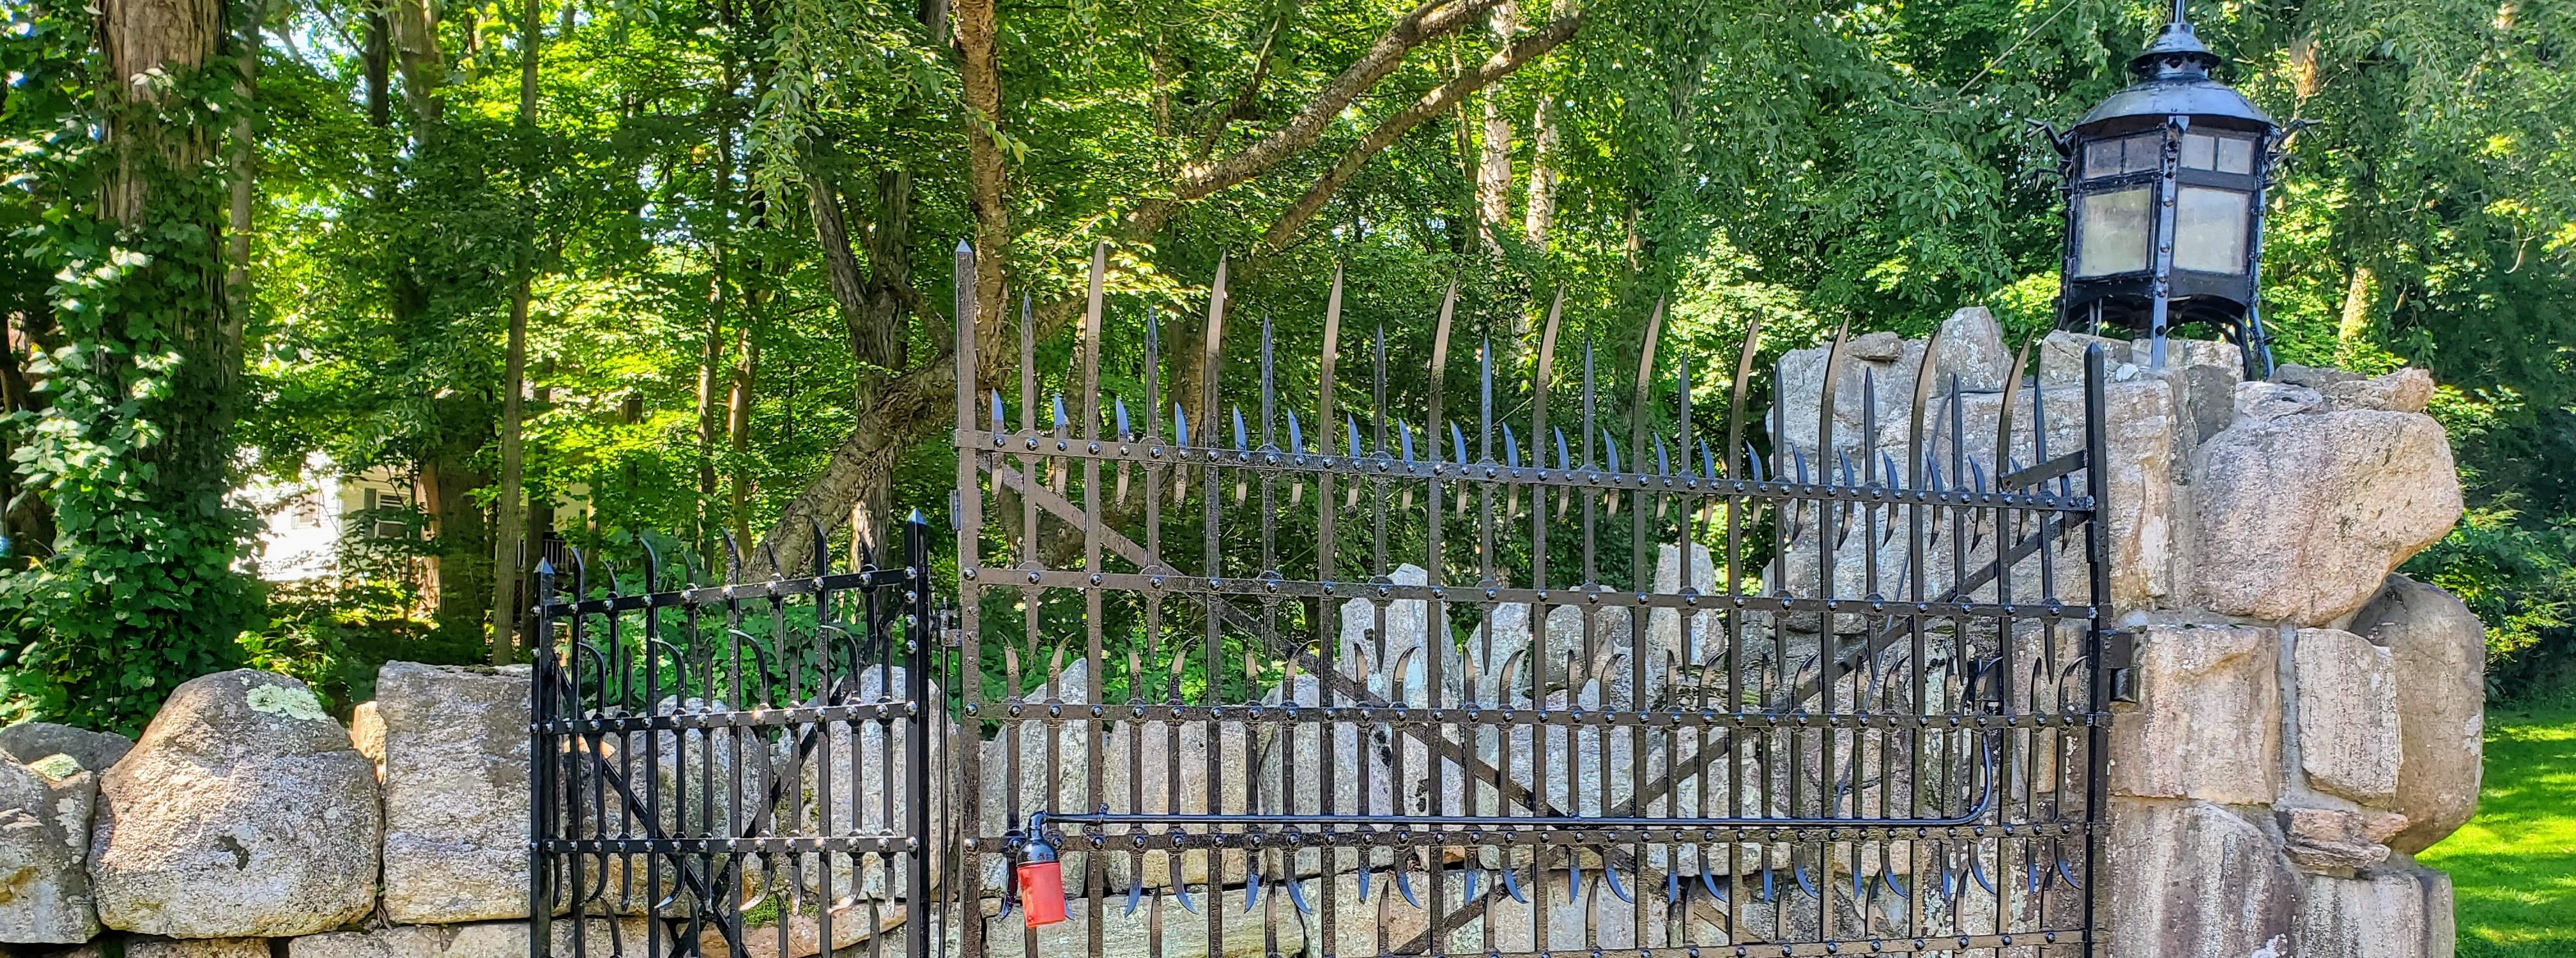 Original Iron Fence & Lantern